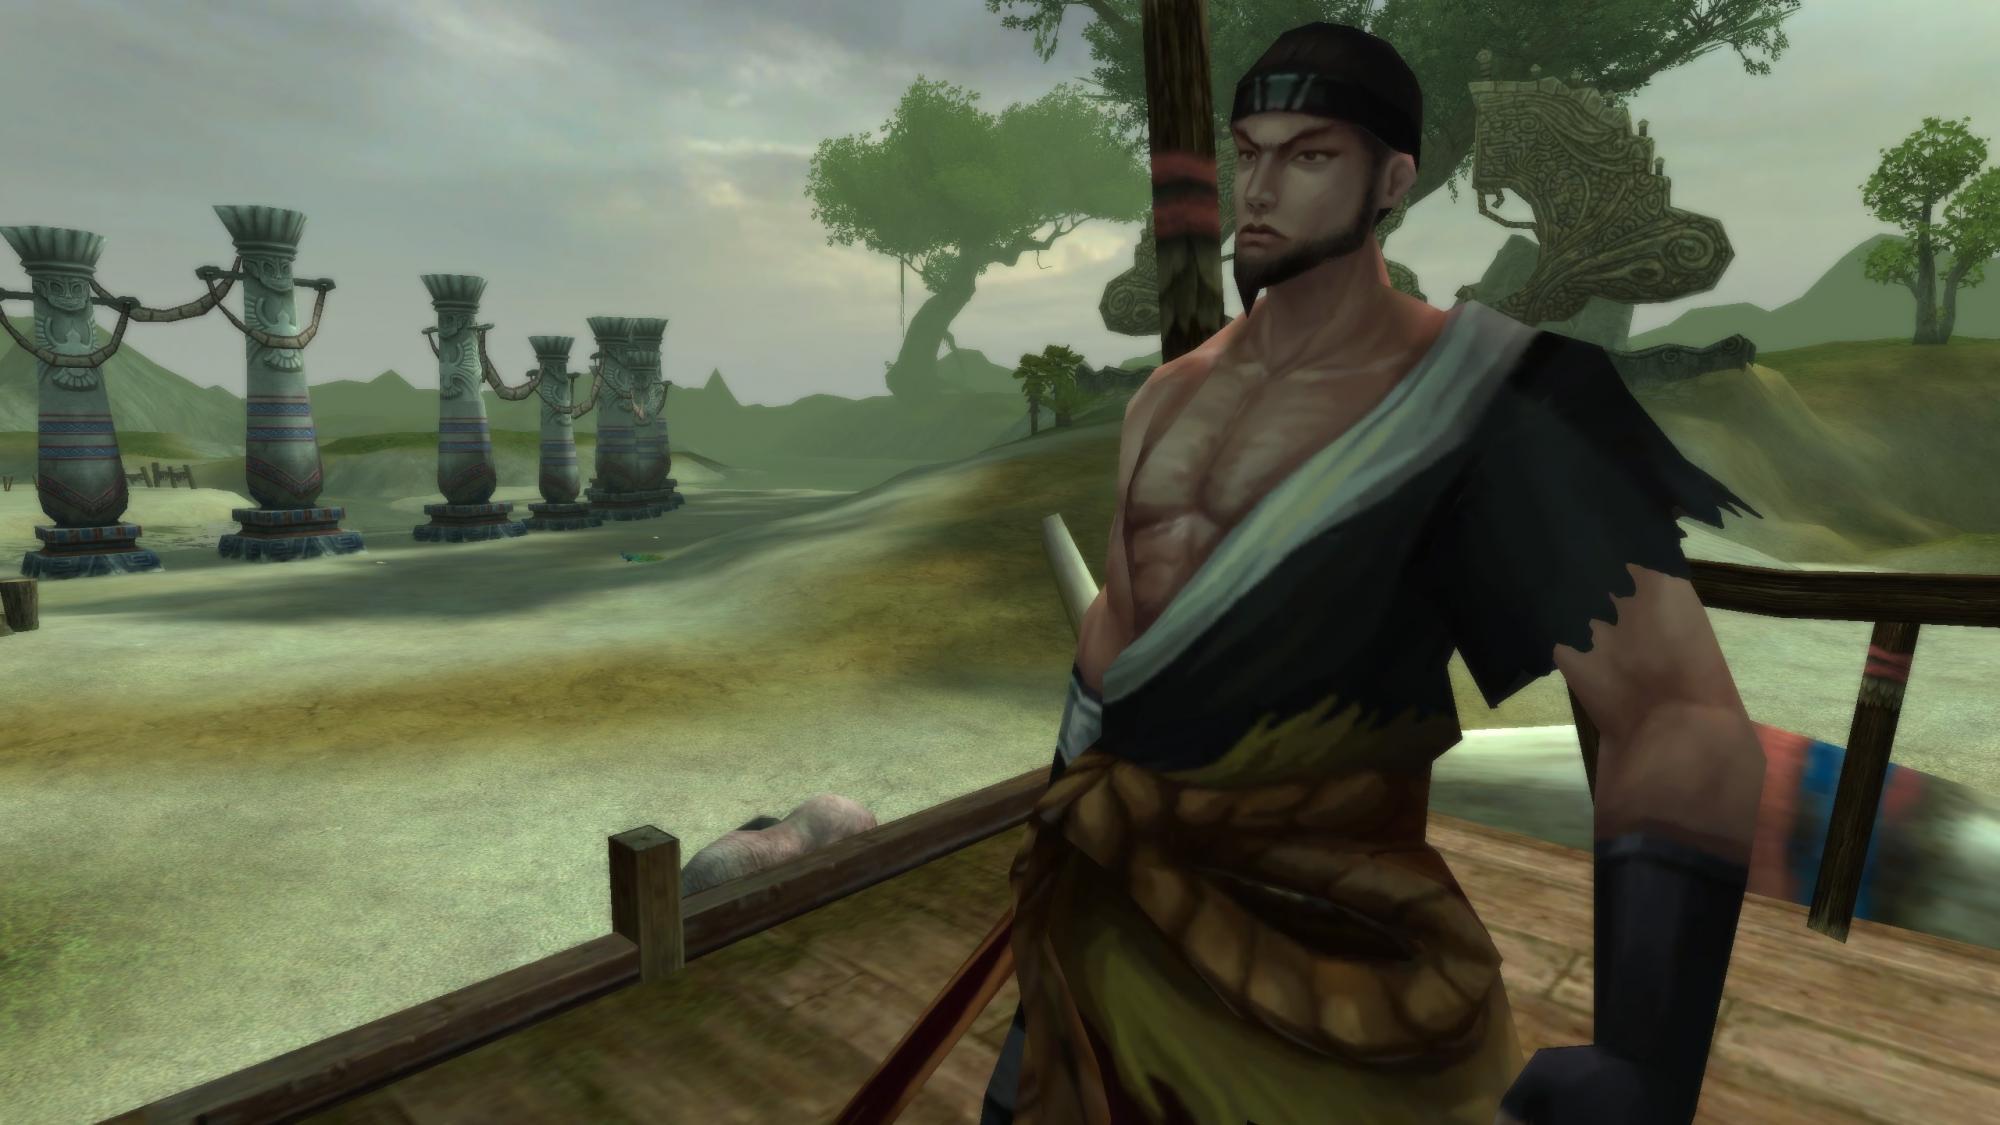 Click image for larger version.Name:Heroes of Three Kingdoms 5.jpgViews:159Size:180.8 KBID:800